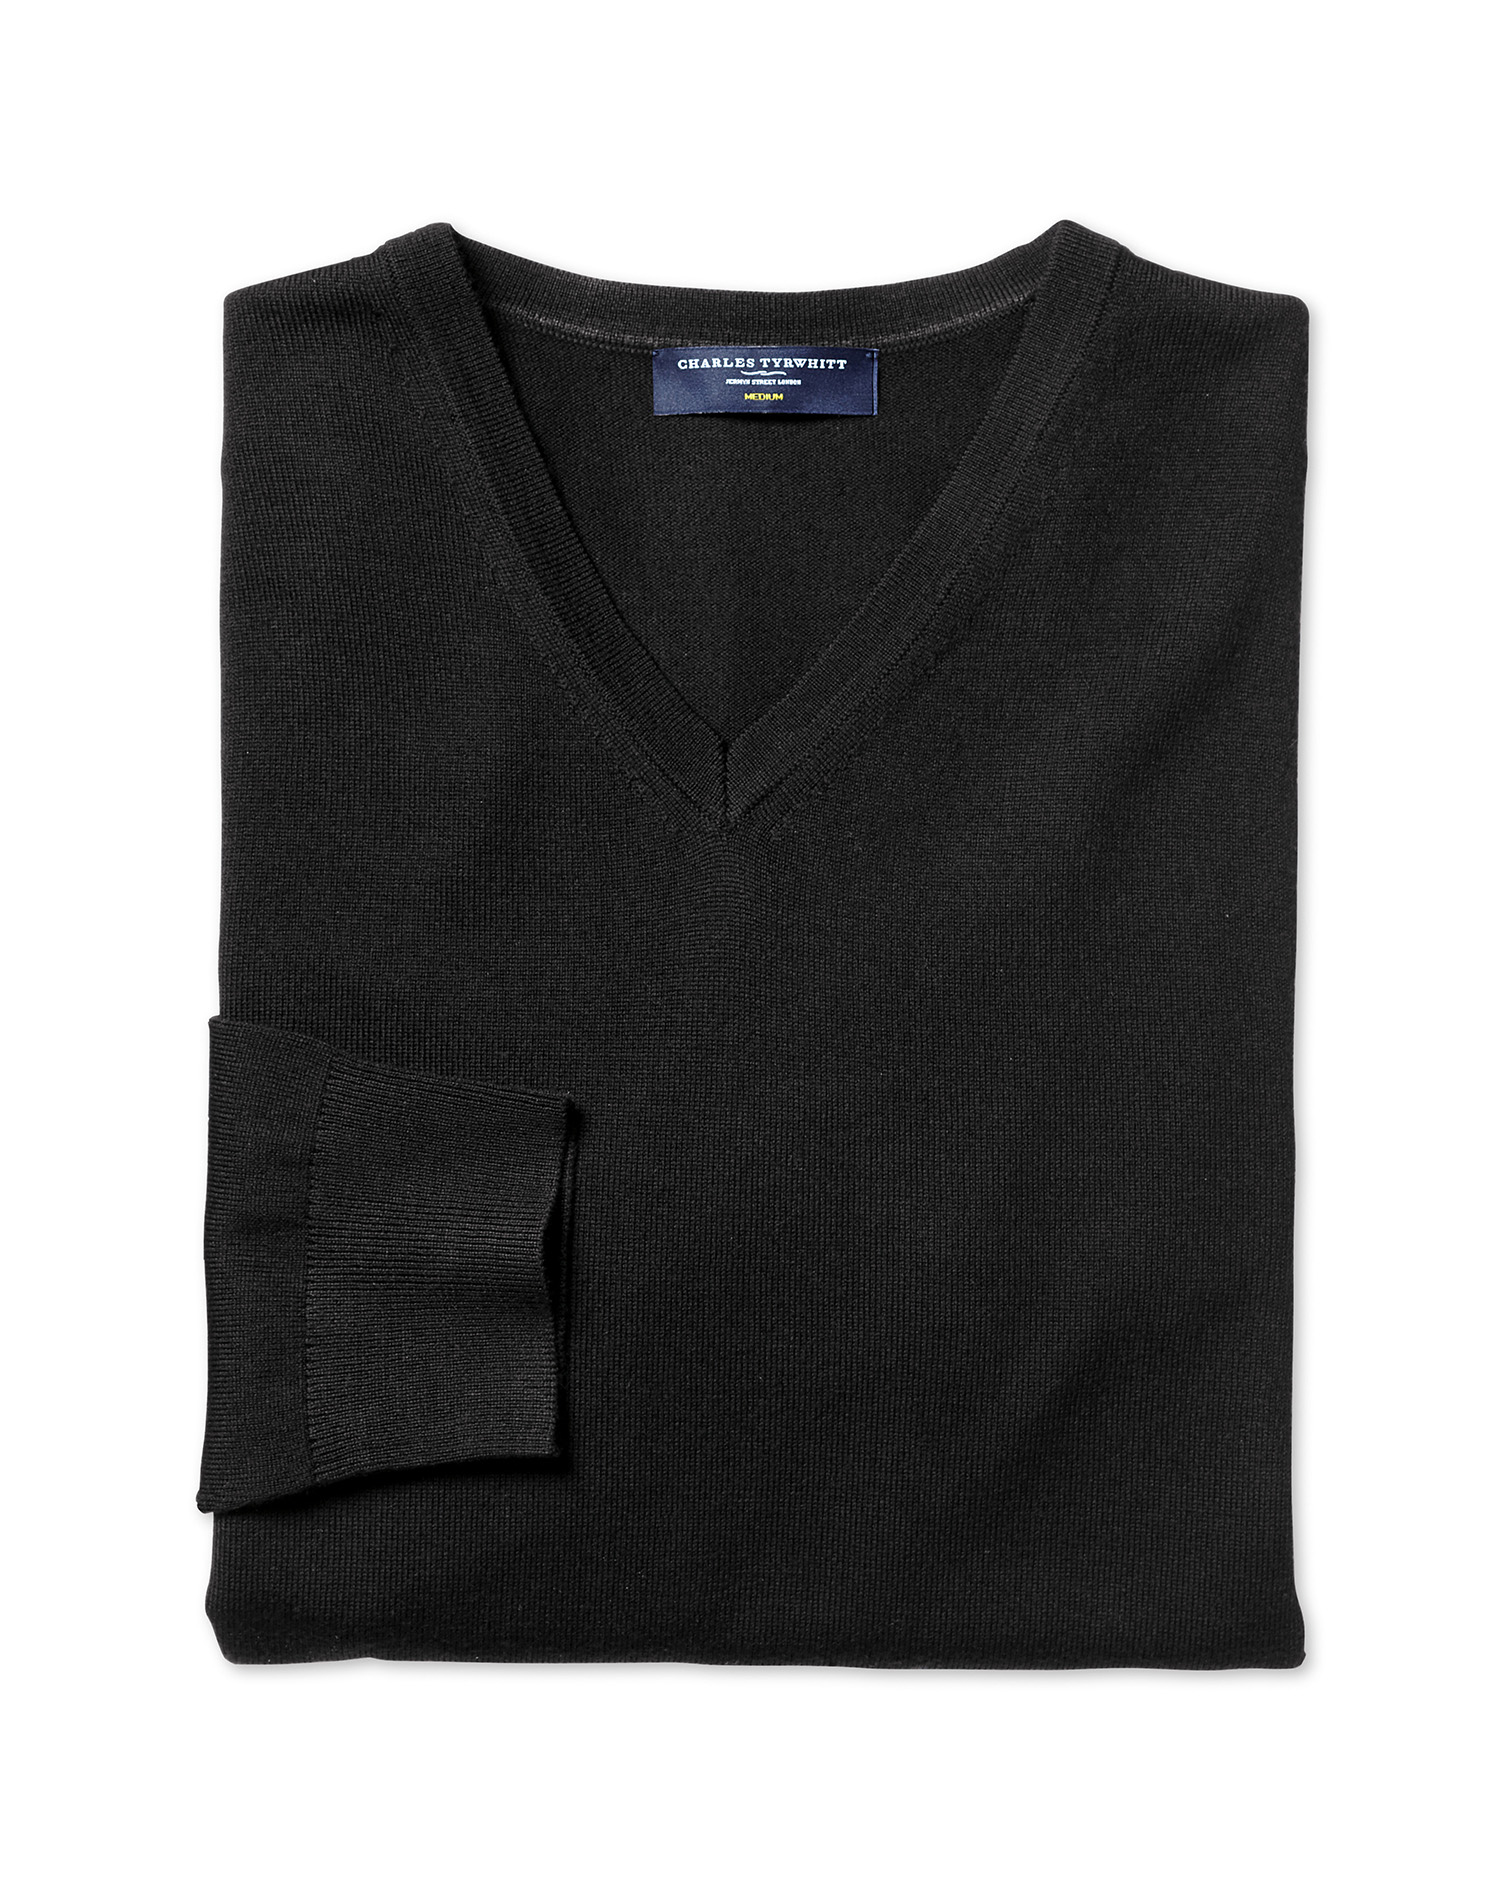 Black Merino Wool V-Neck Jumper Size Medium by Charles Tyrwhitt